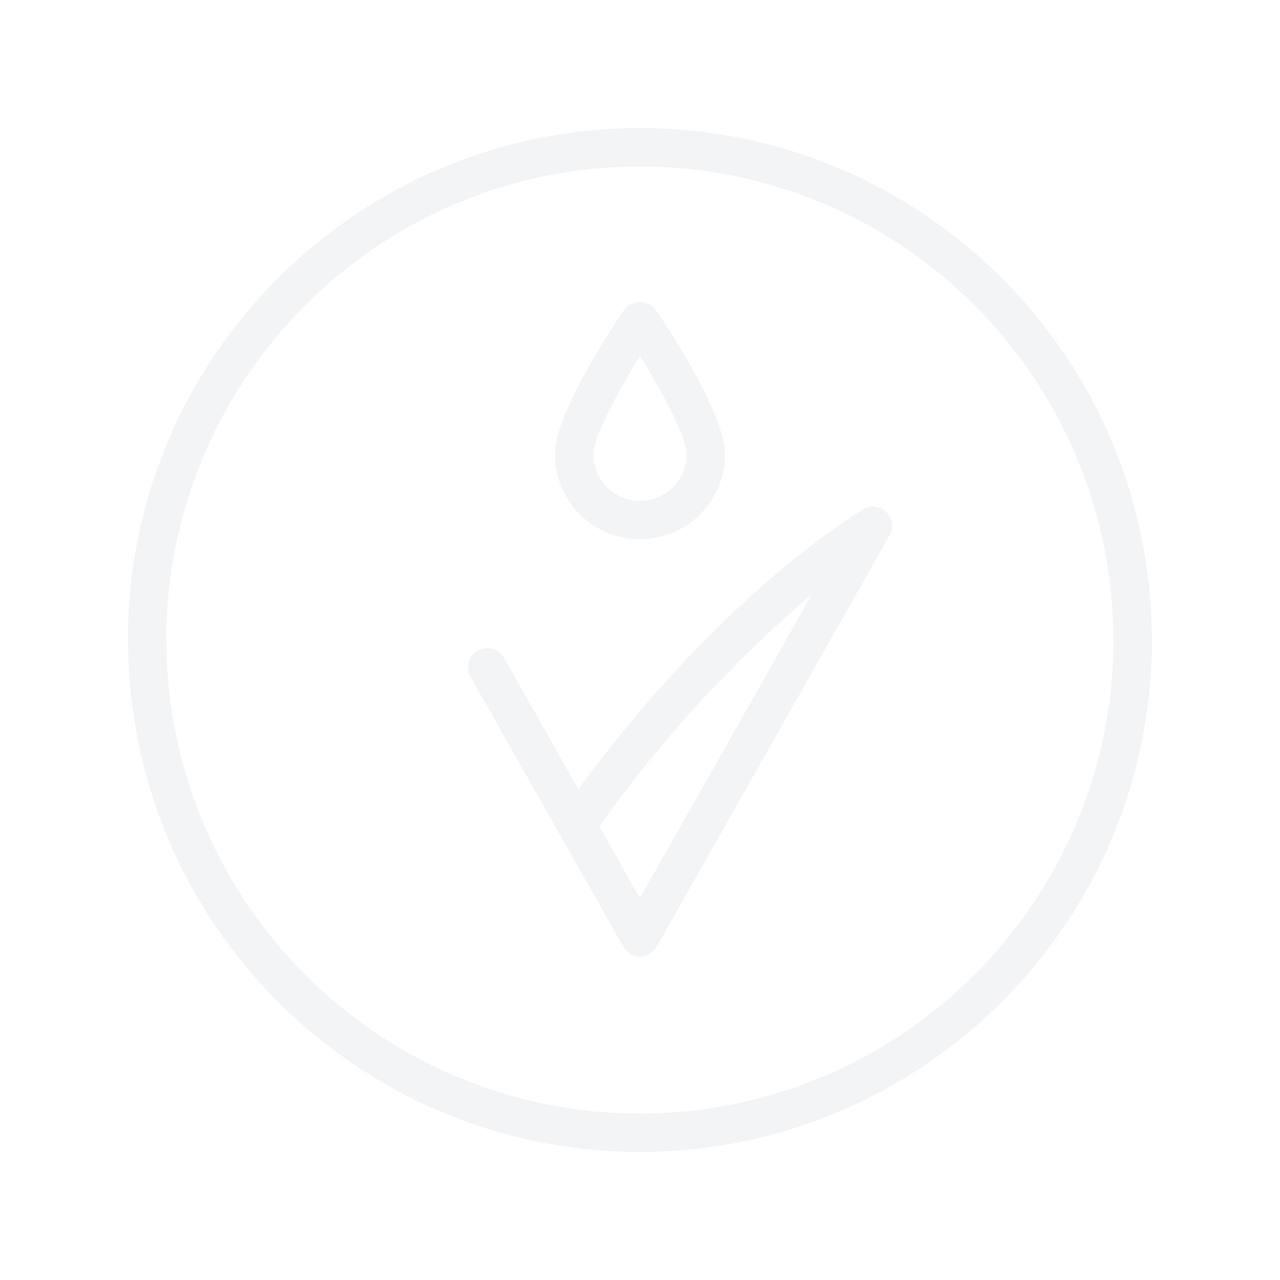 MAXEYLASH Eyelash Enhancing Serum 3ml